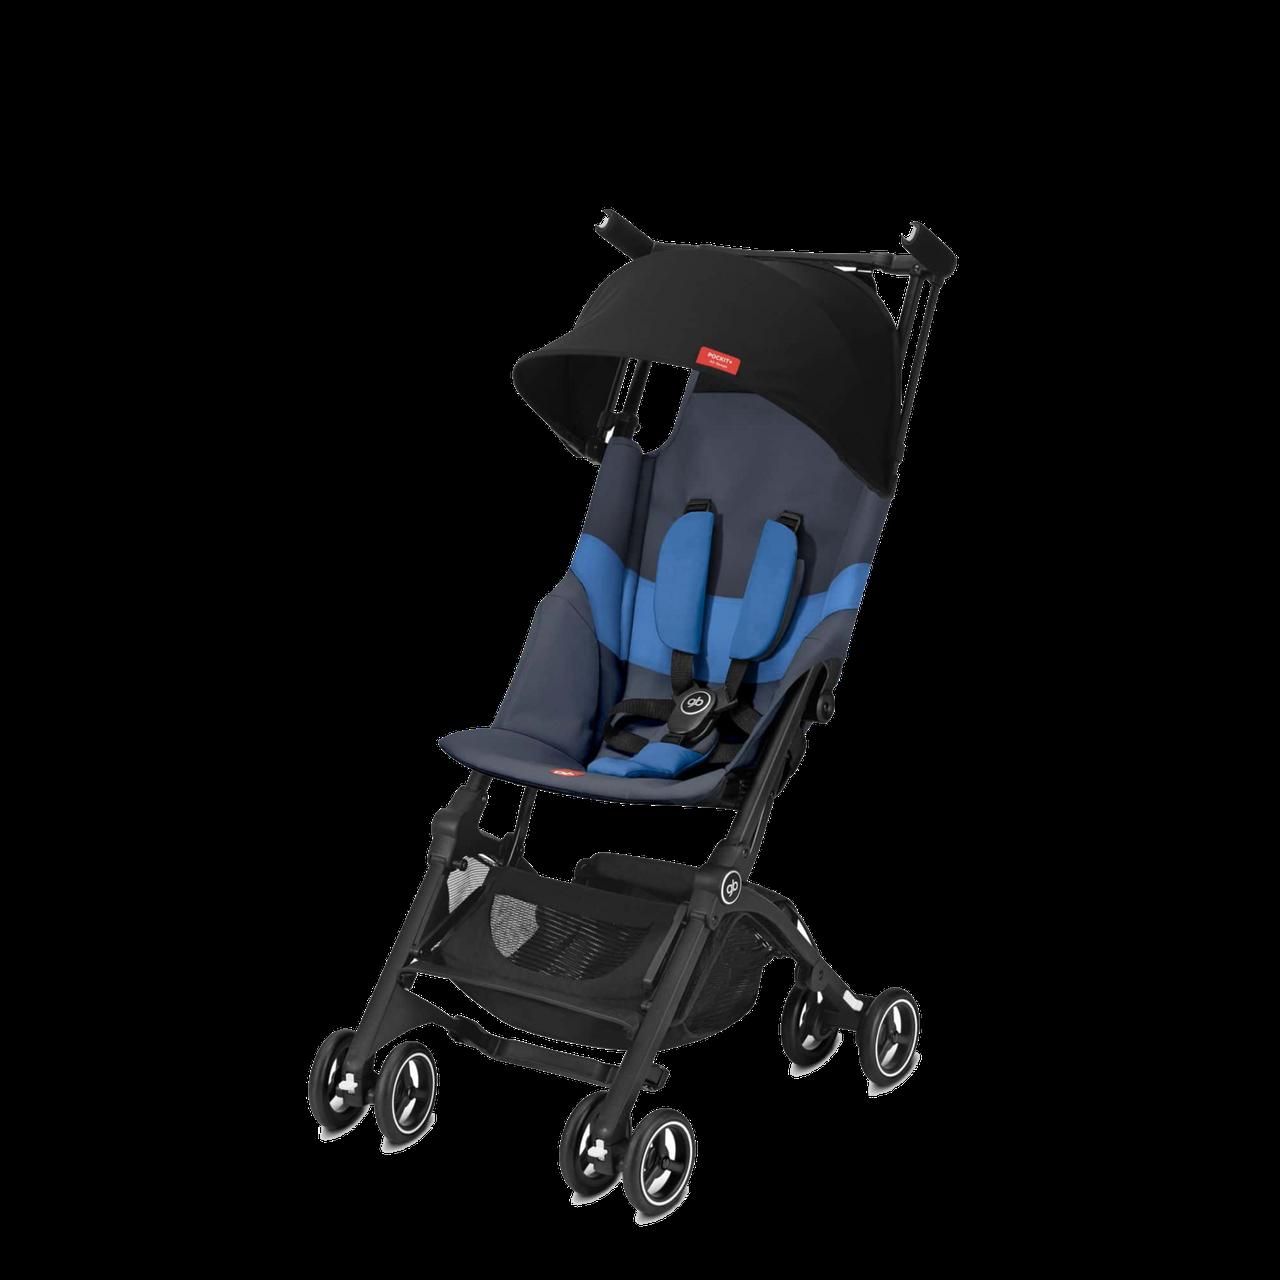 GB - Коляска Pockit+ All-Terrain, цвет Night Blue (2019 г)